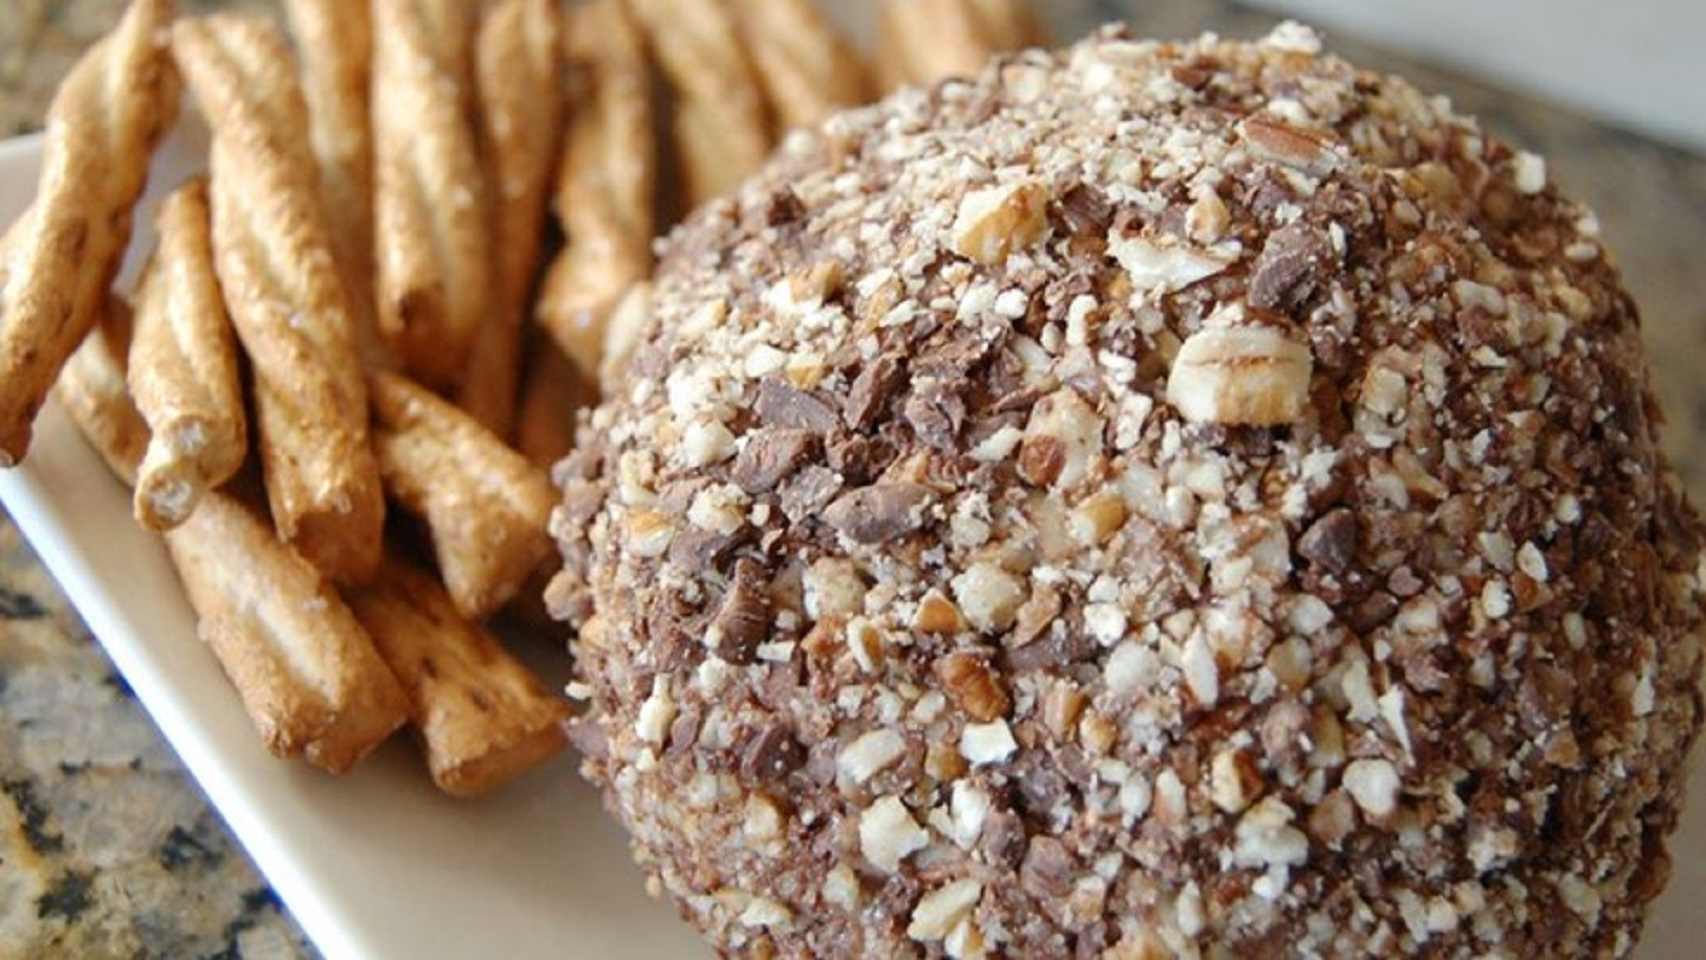 Chocolate Chip Cheese Ball Sarath Kumar